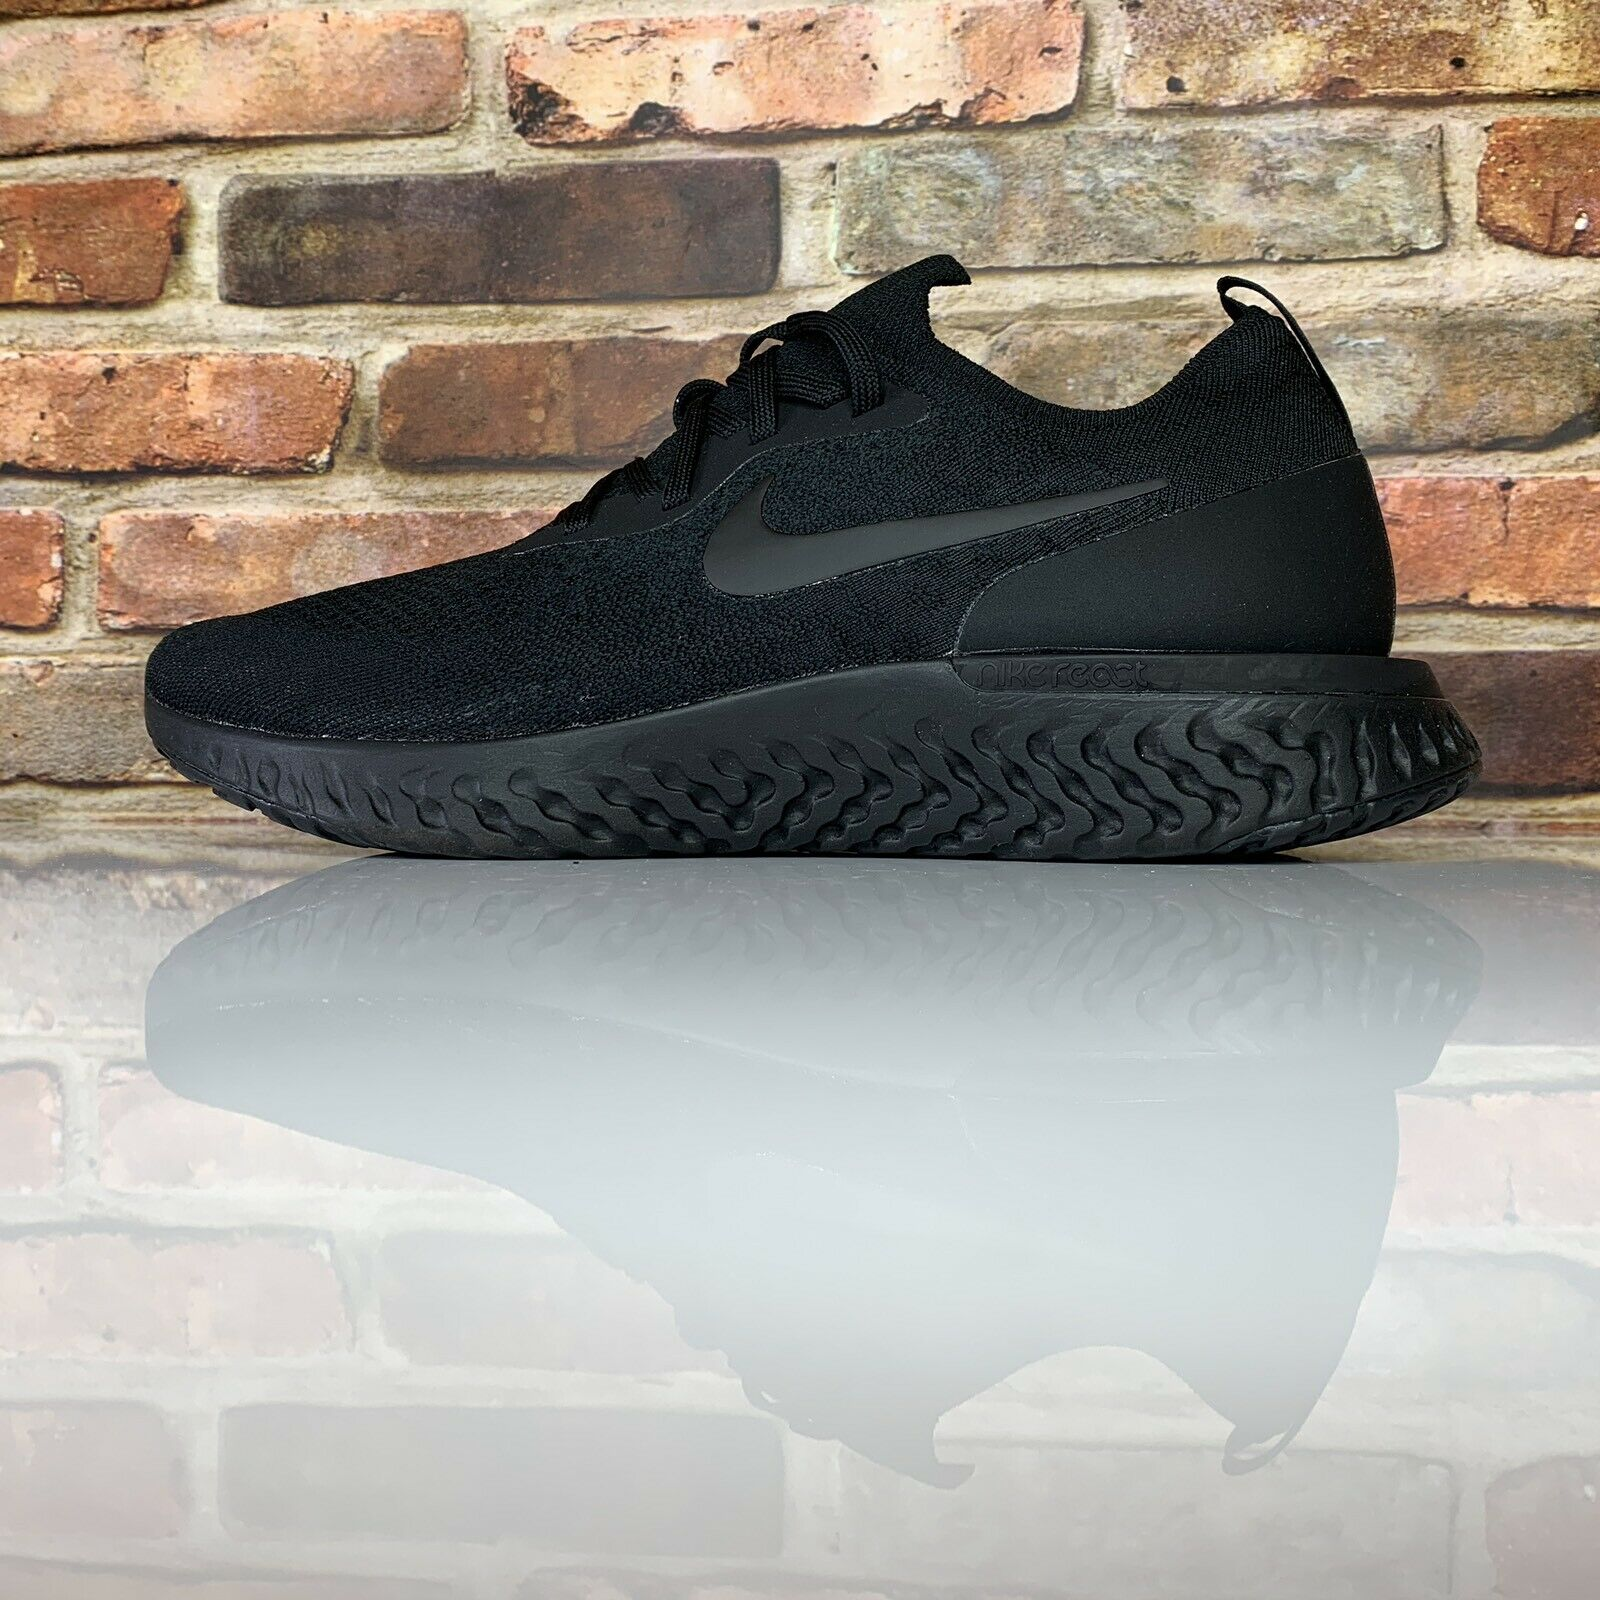 Nike Epic Réact Flyknit Pointure 10.5 Triple noir chaussures Course AQ0067-003